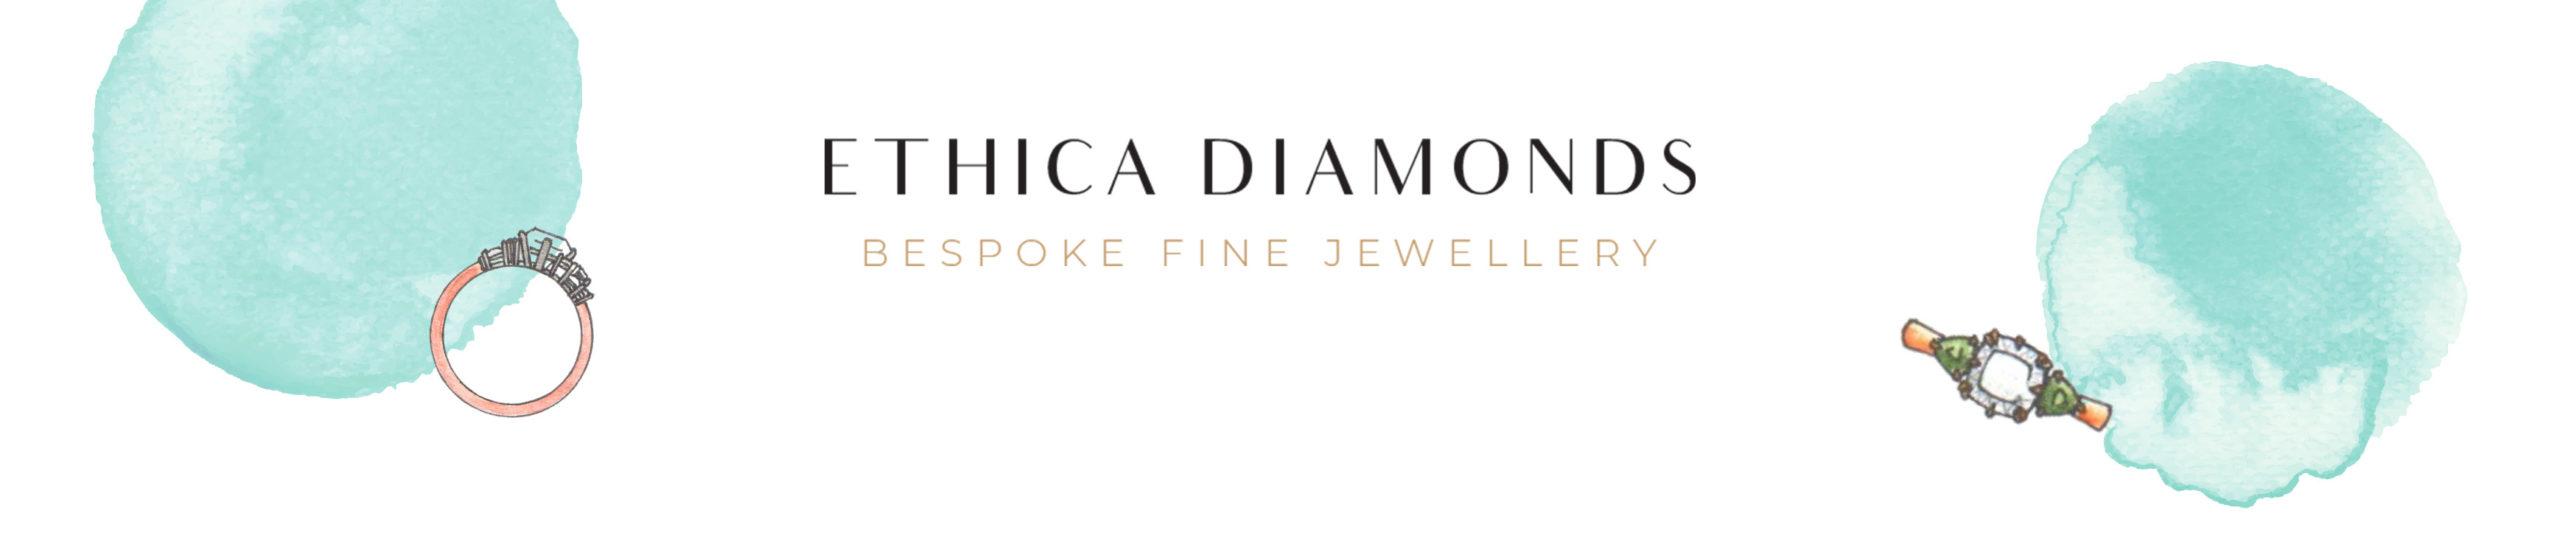 Ethica Diamonds - Bespoke Fine Jewellery